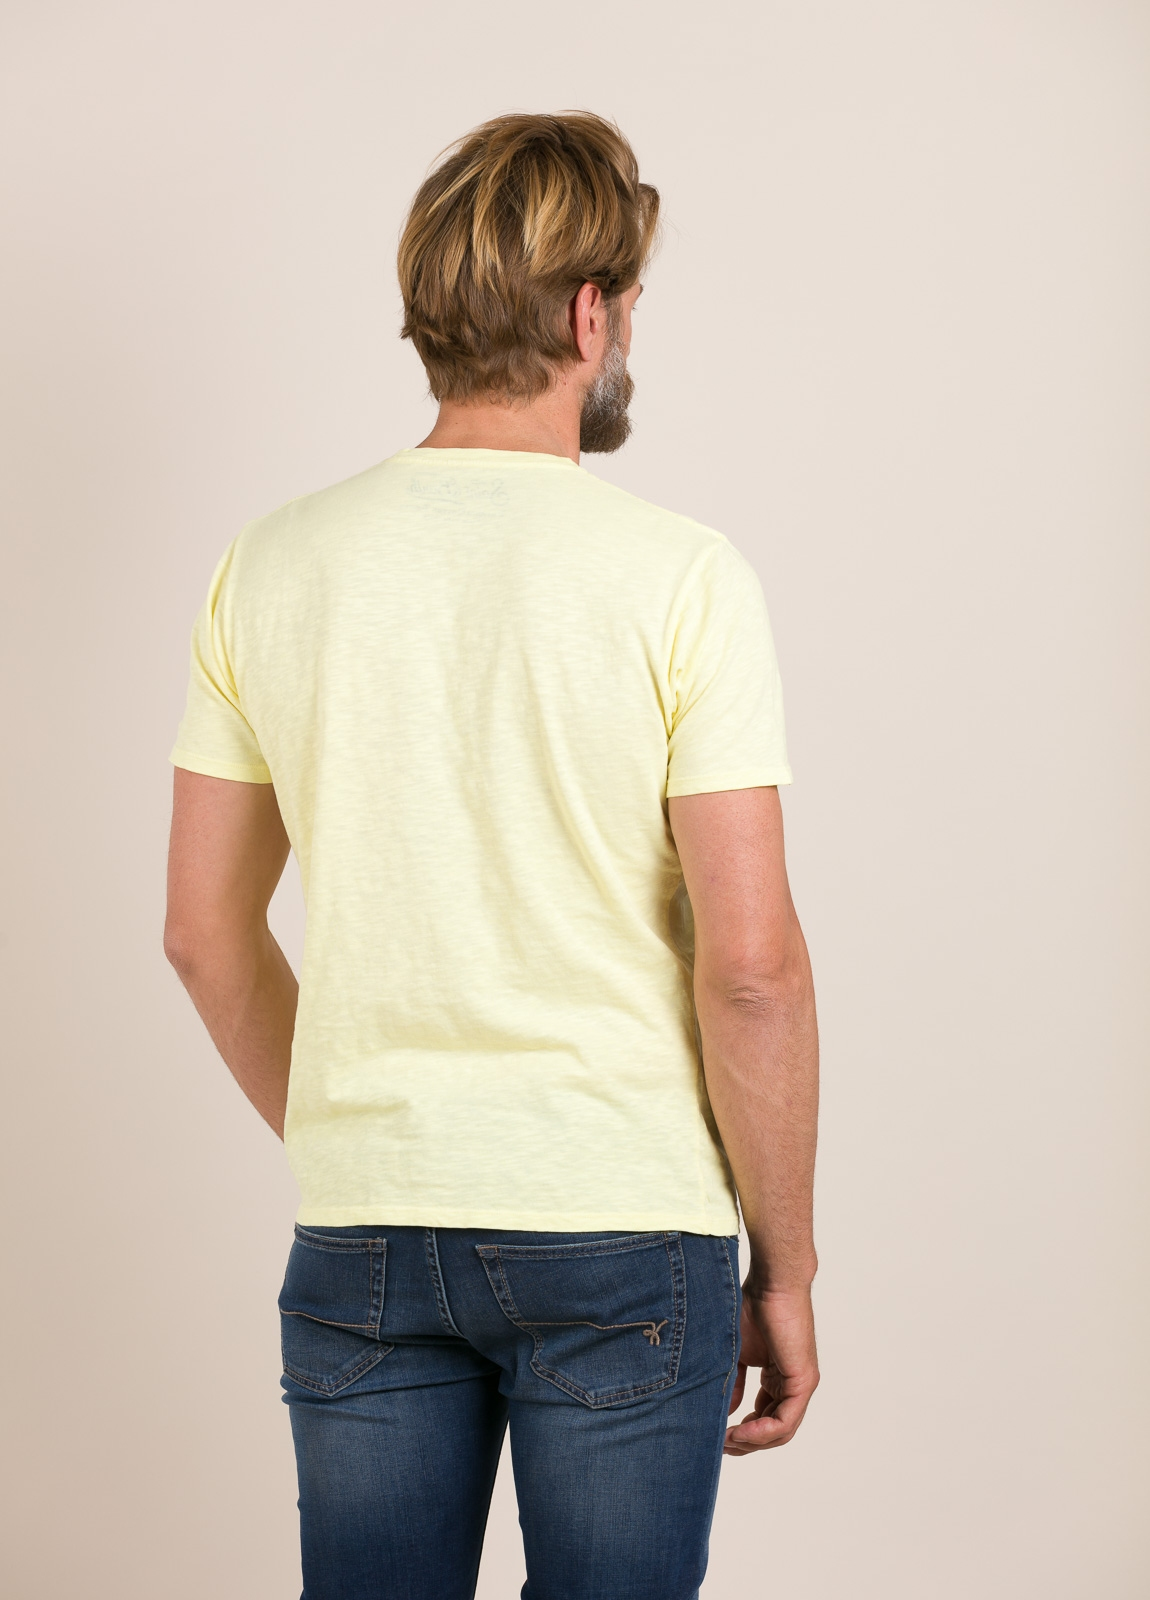 Camiseta MC2 cuba libre amarillo - Ítem1